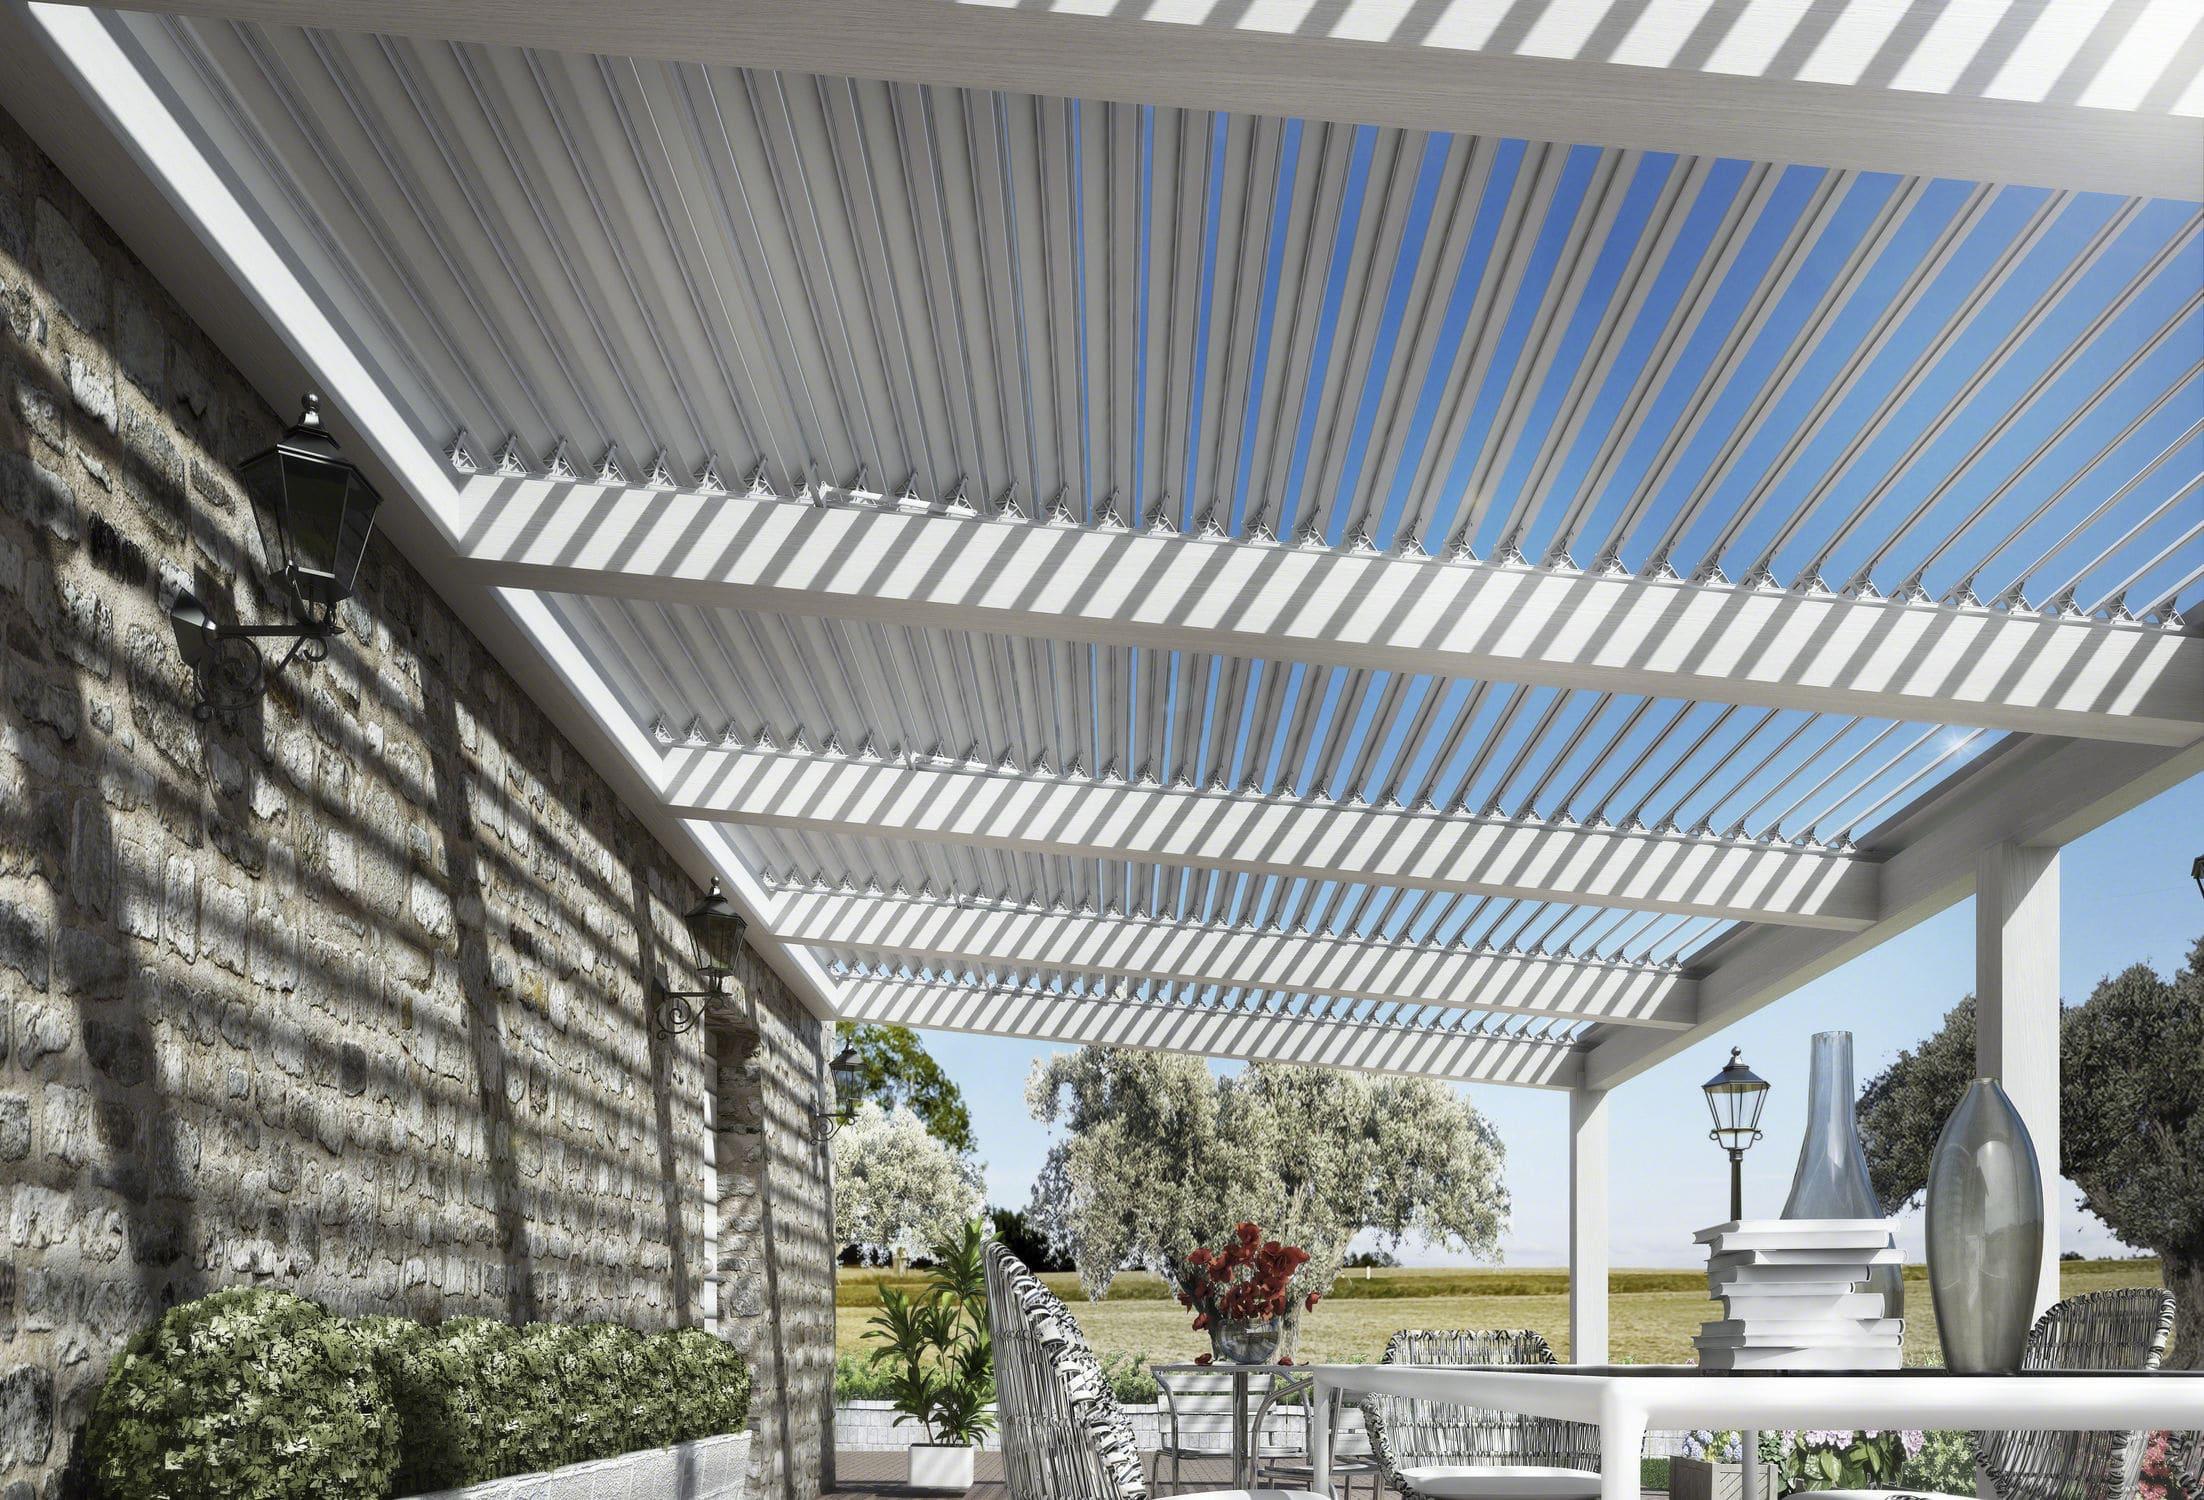 Superieur Hanging Pergola / Aluminum / With Mobile Slats / Sun Shade Louvers ...